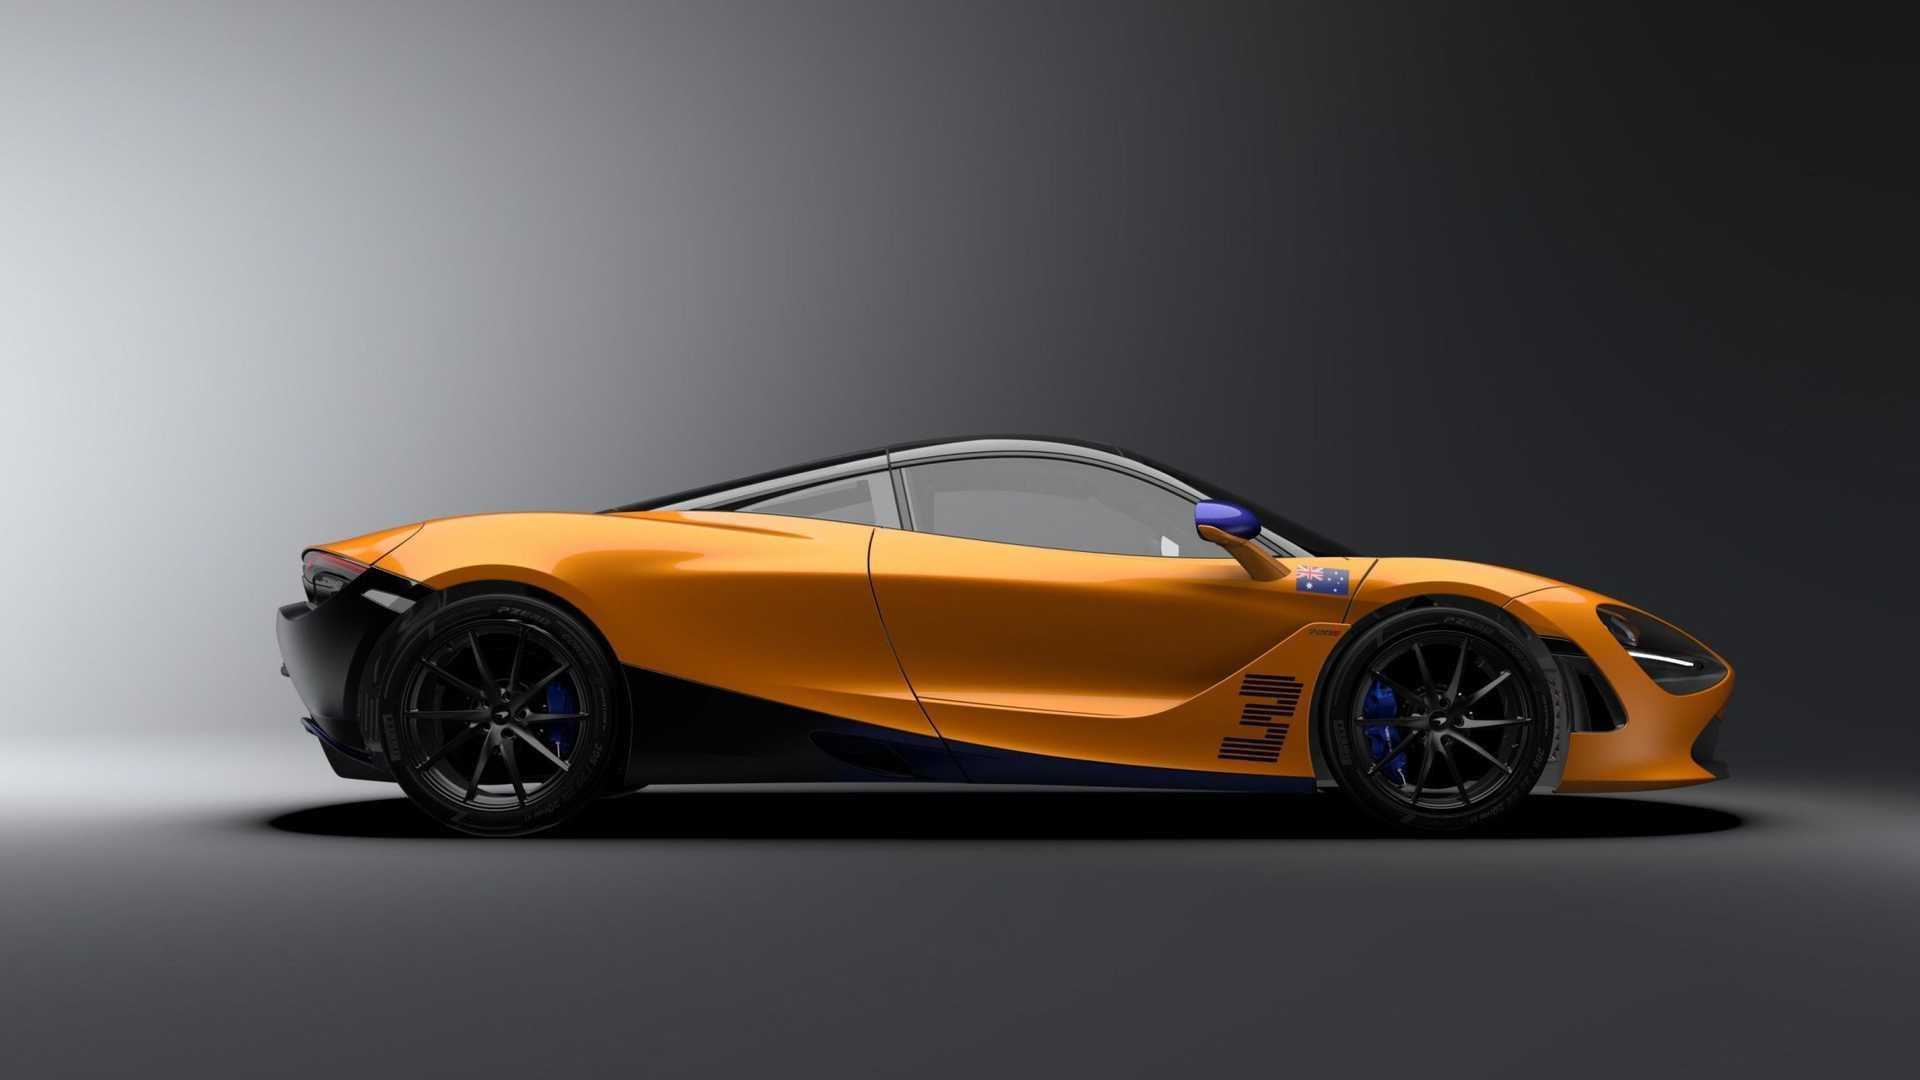 McLaren-720S-Daniel-Ricciardo-Edition-4